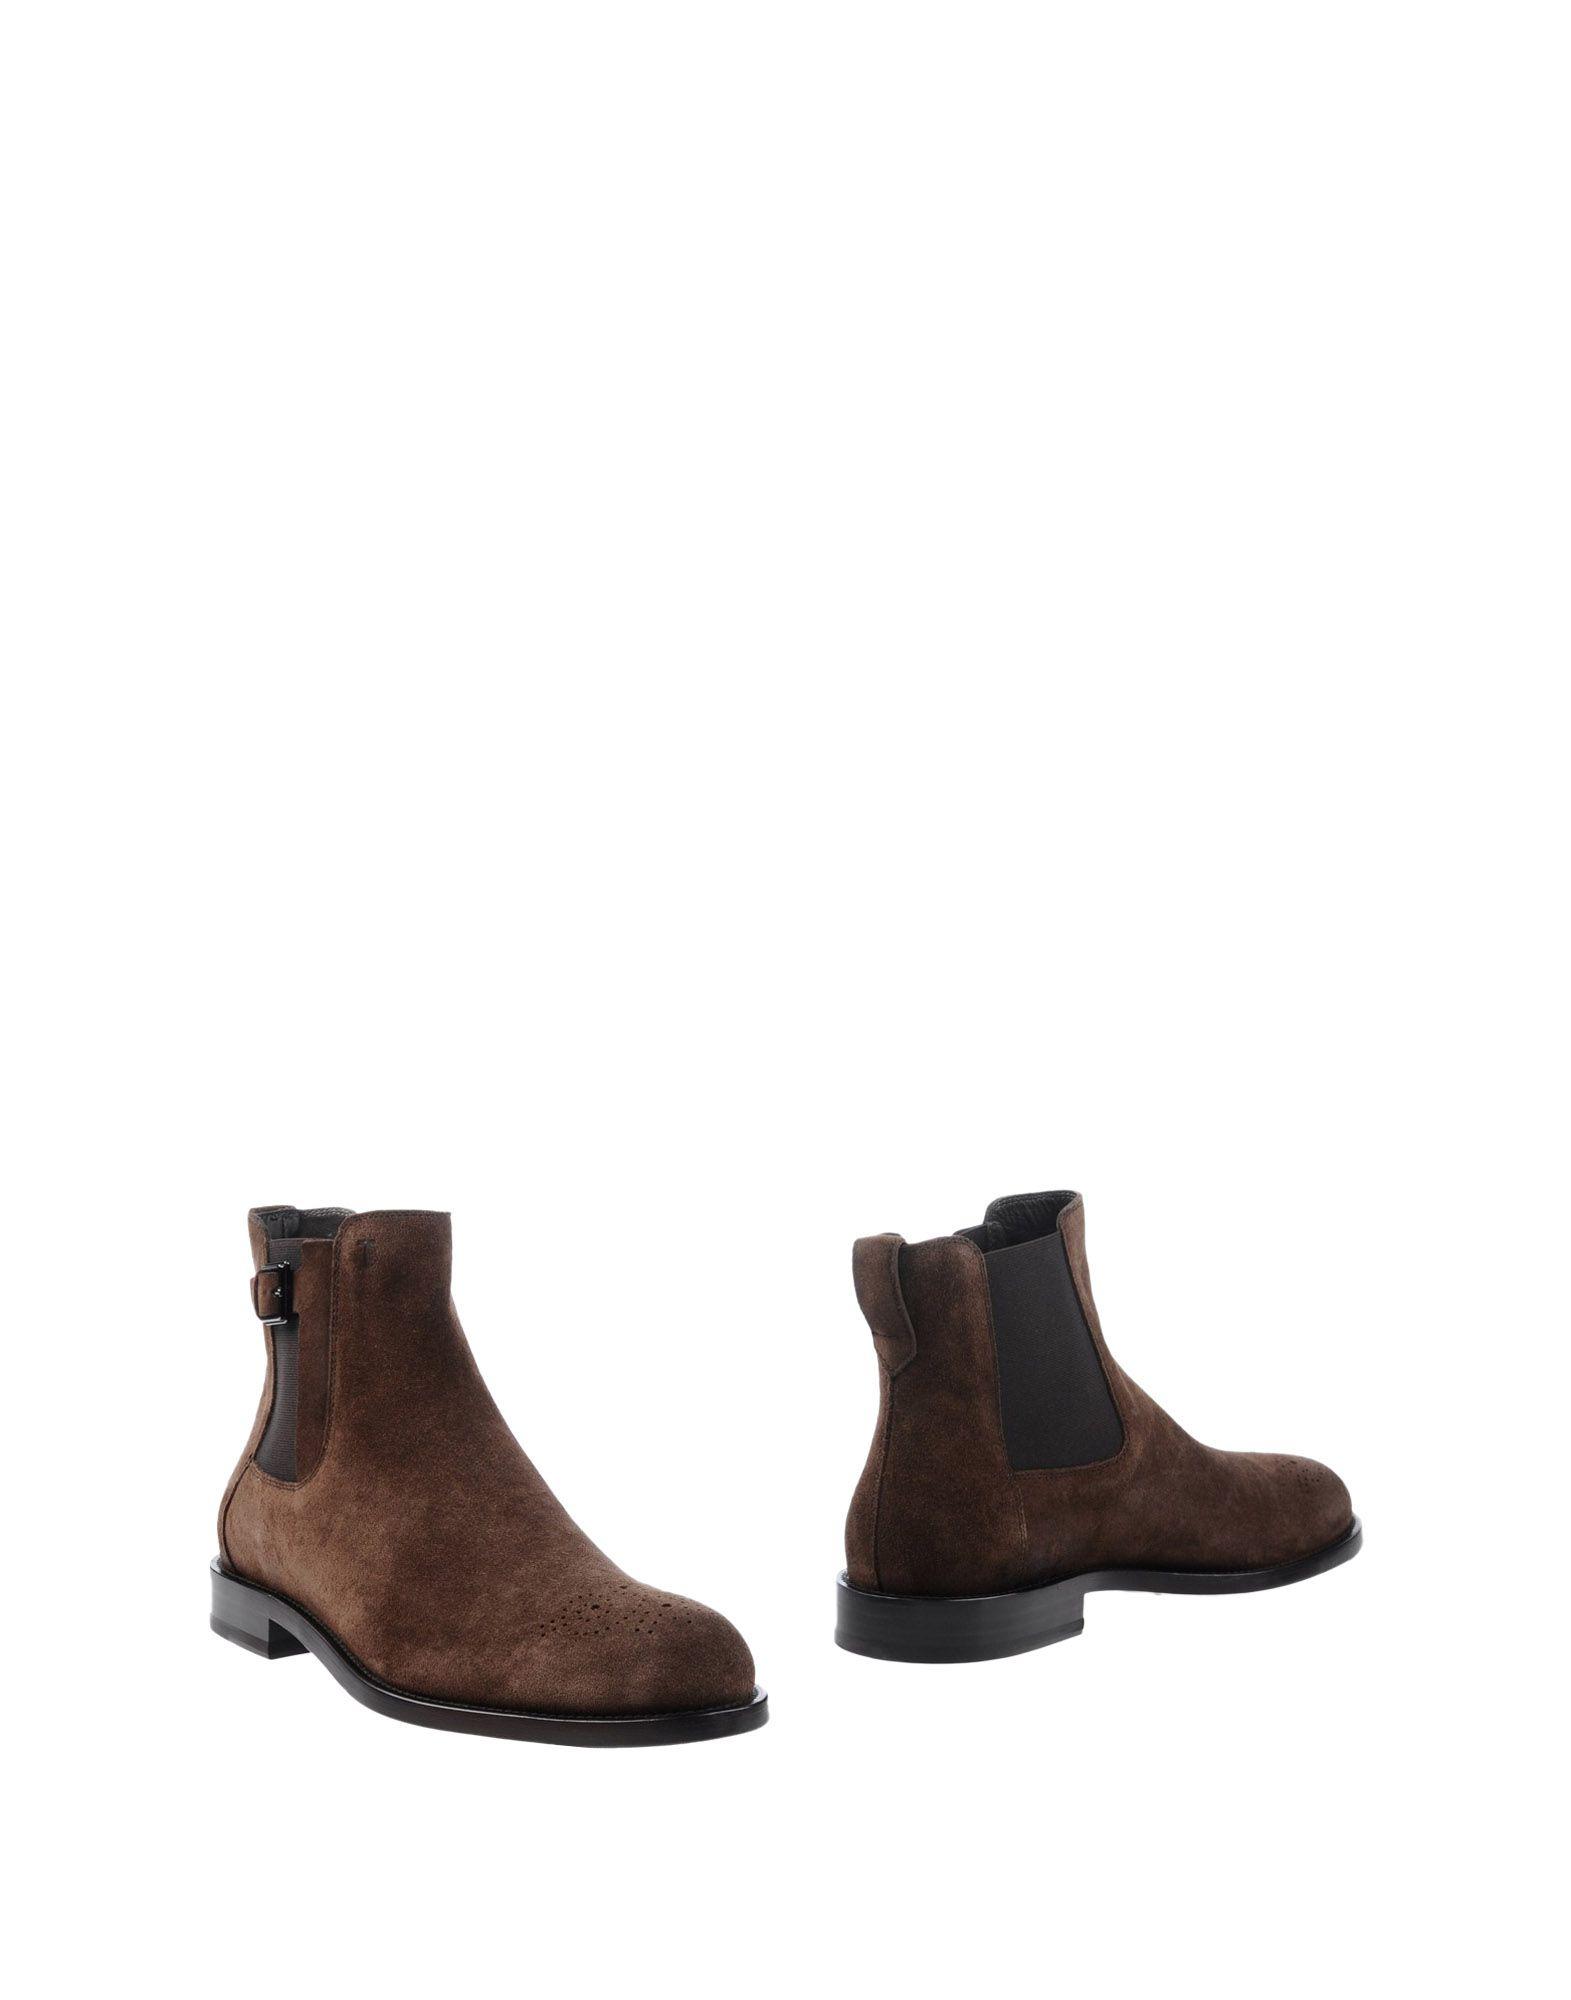 Bottine Tod's Homme - Bottines Tod's  Moka Chaussures femme pas cher homme et femme